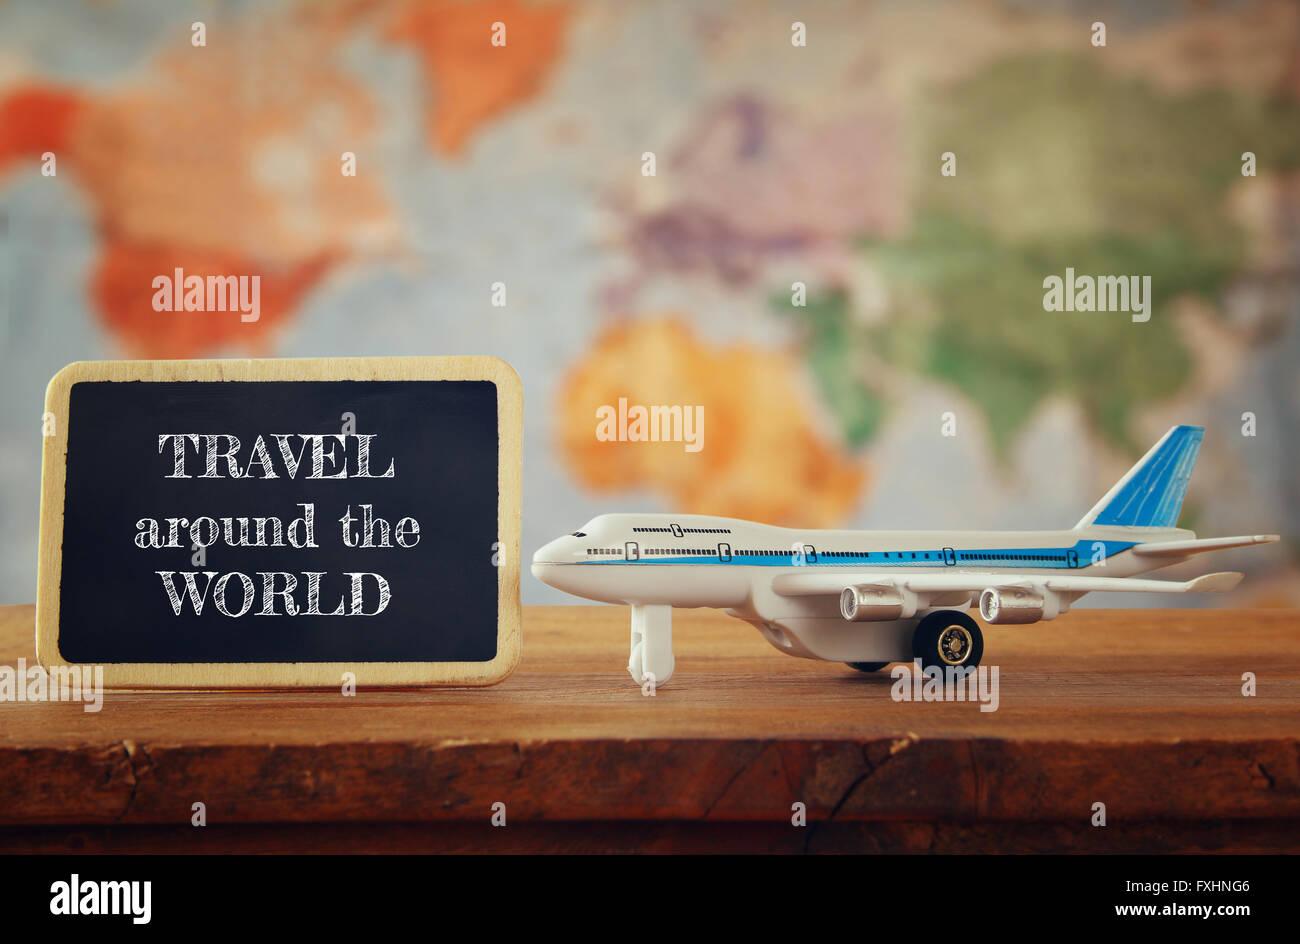 Flugzeug Spielzeug neben Tafel. Vintage gefilterten Bild. selektiven Fokus Stockbild